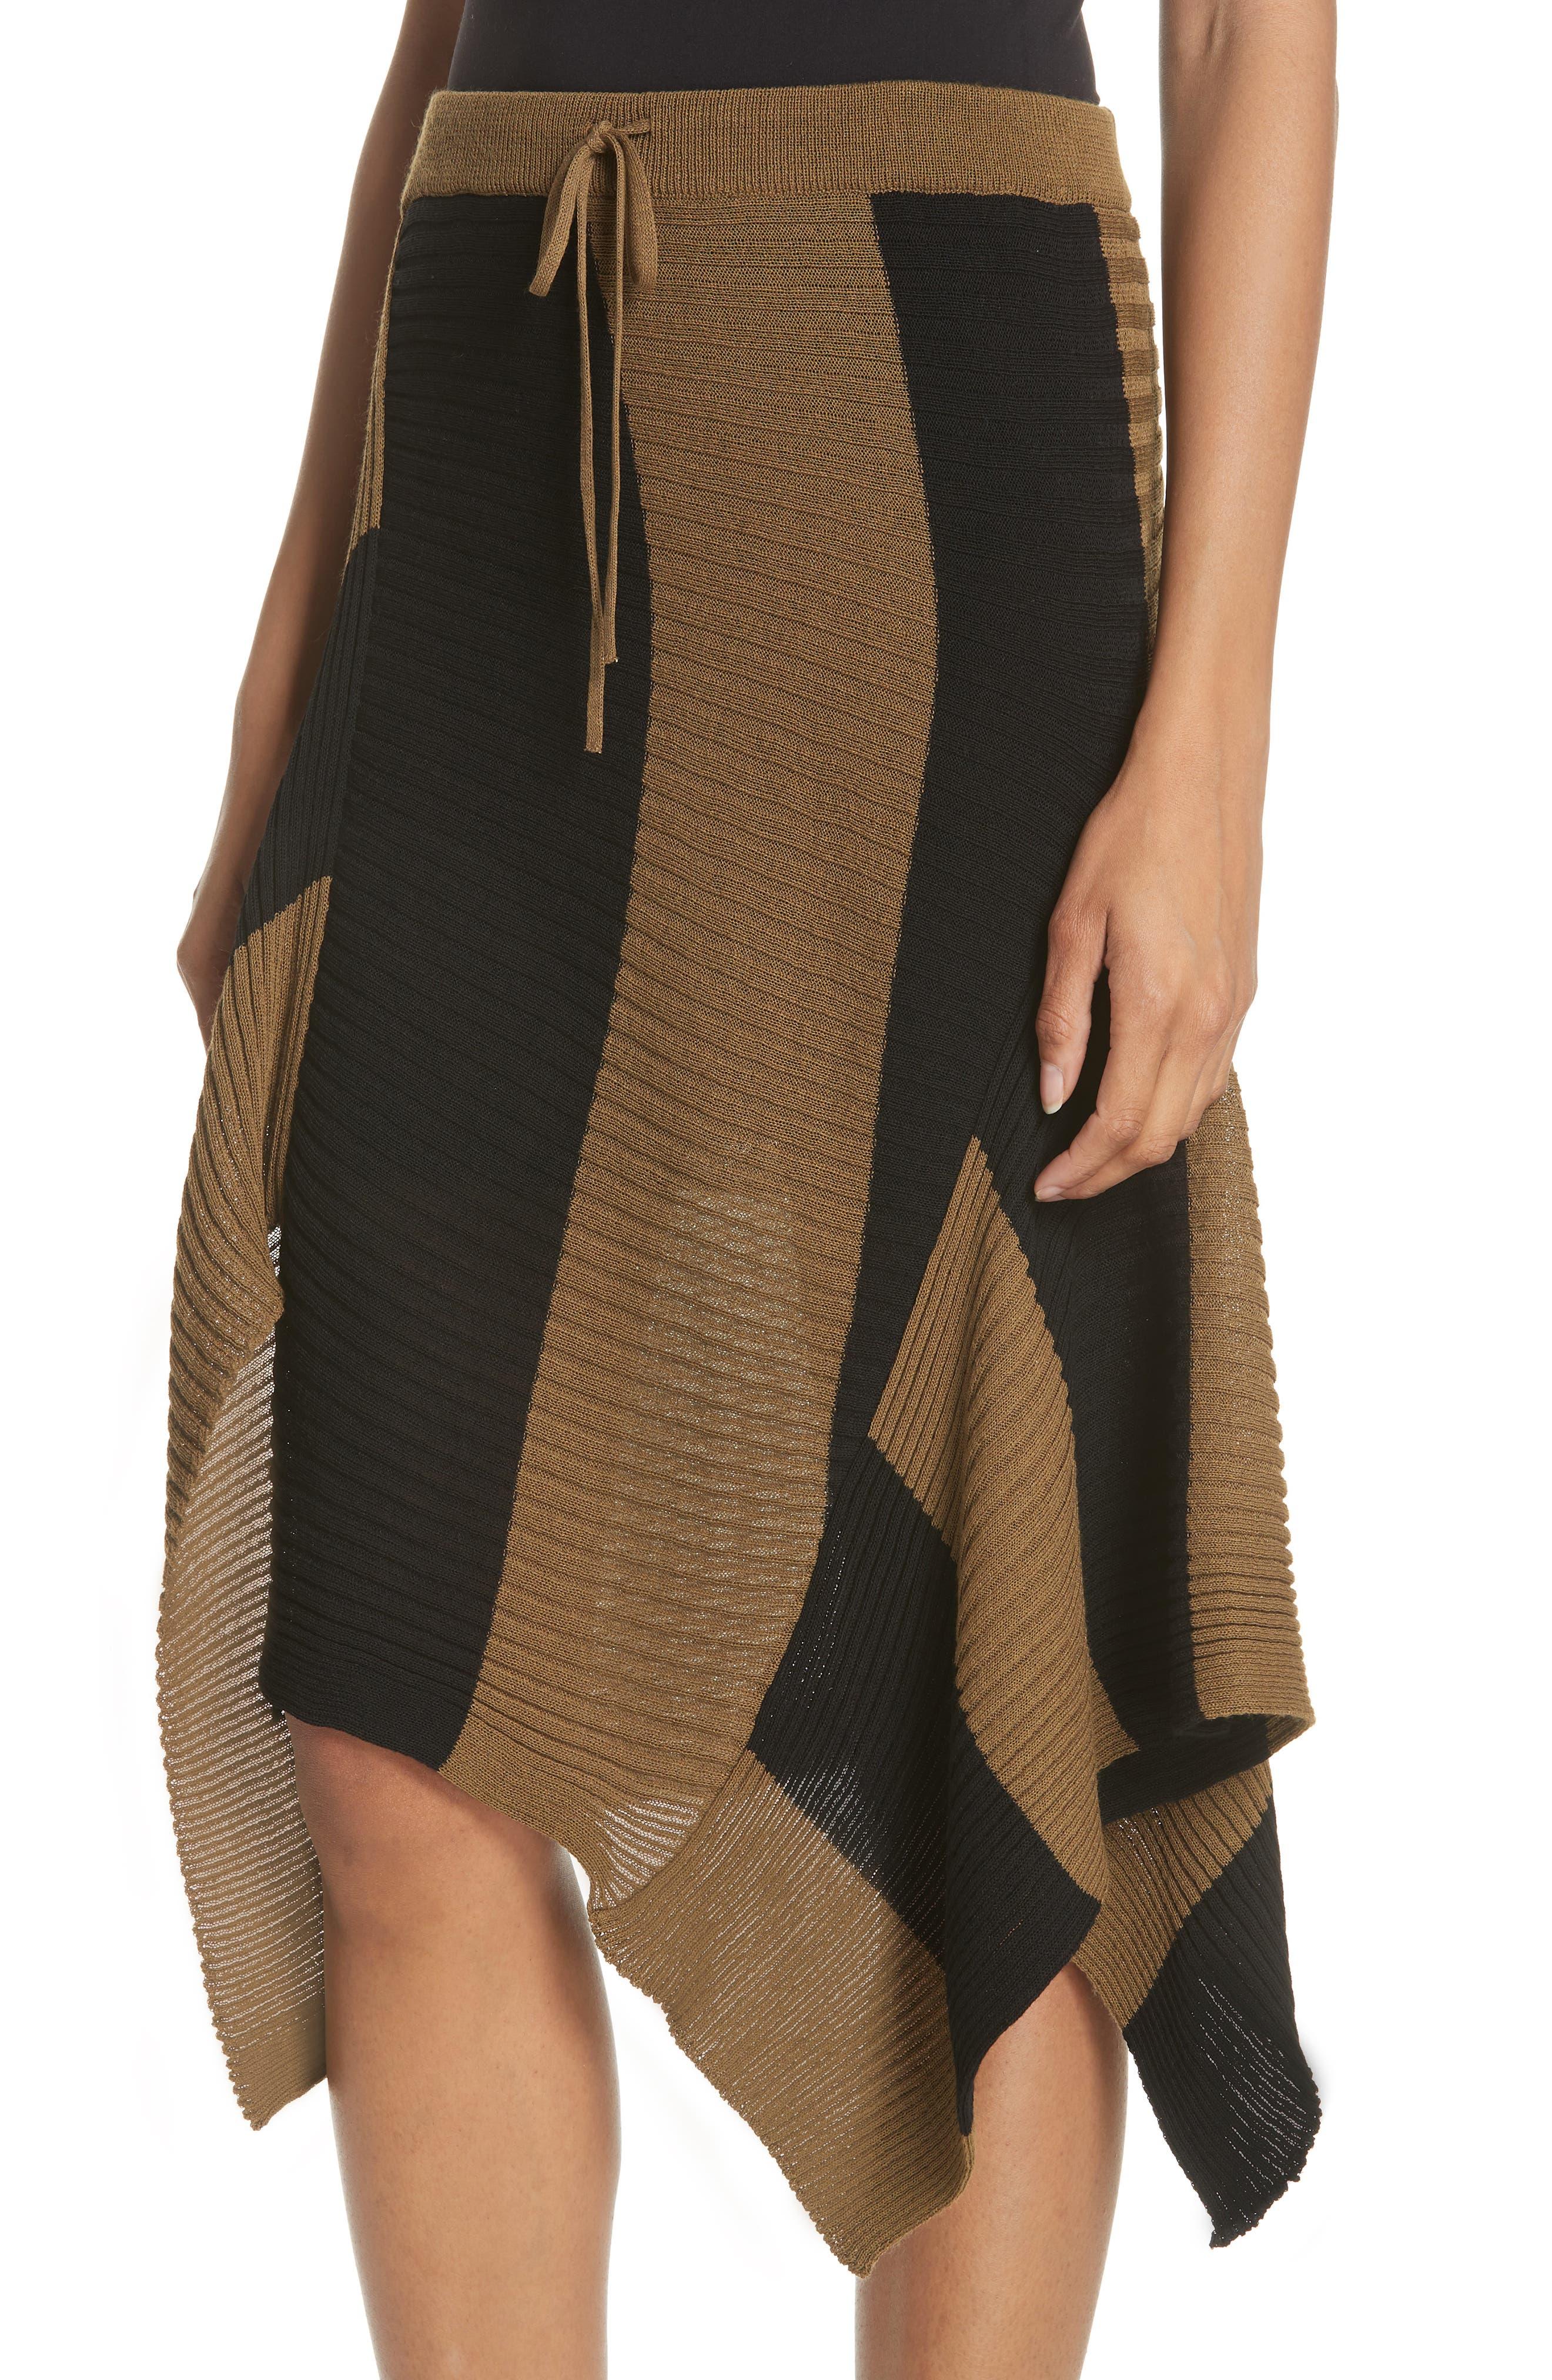 Marques'Almeida Draped Skirt,                             Alternate thumbnail 4, color,                             Khaki/ Black